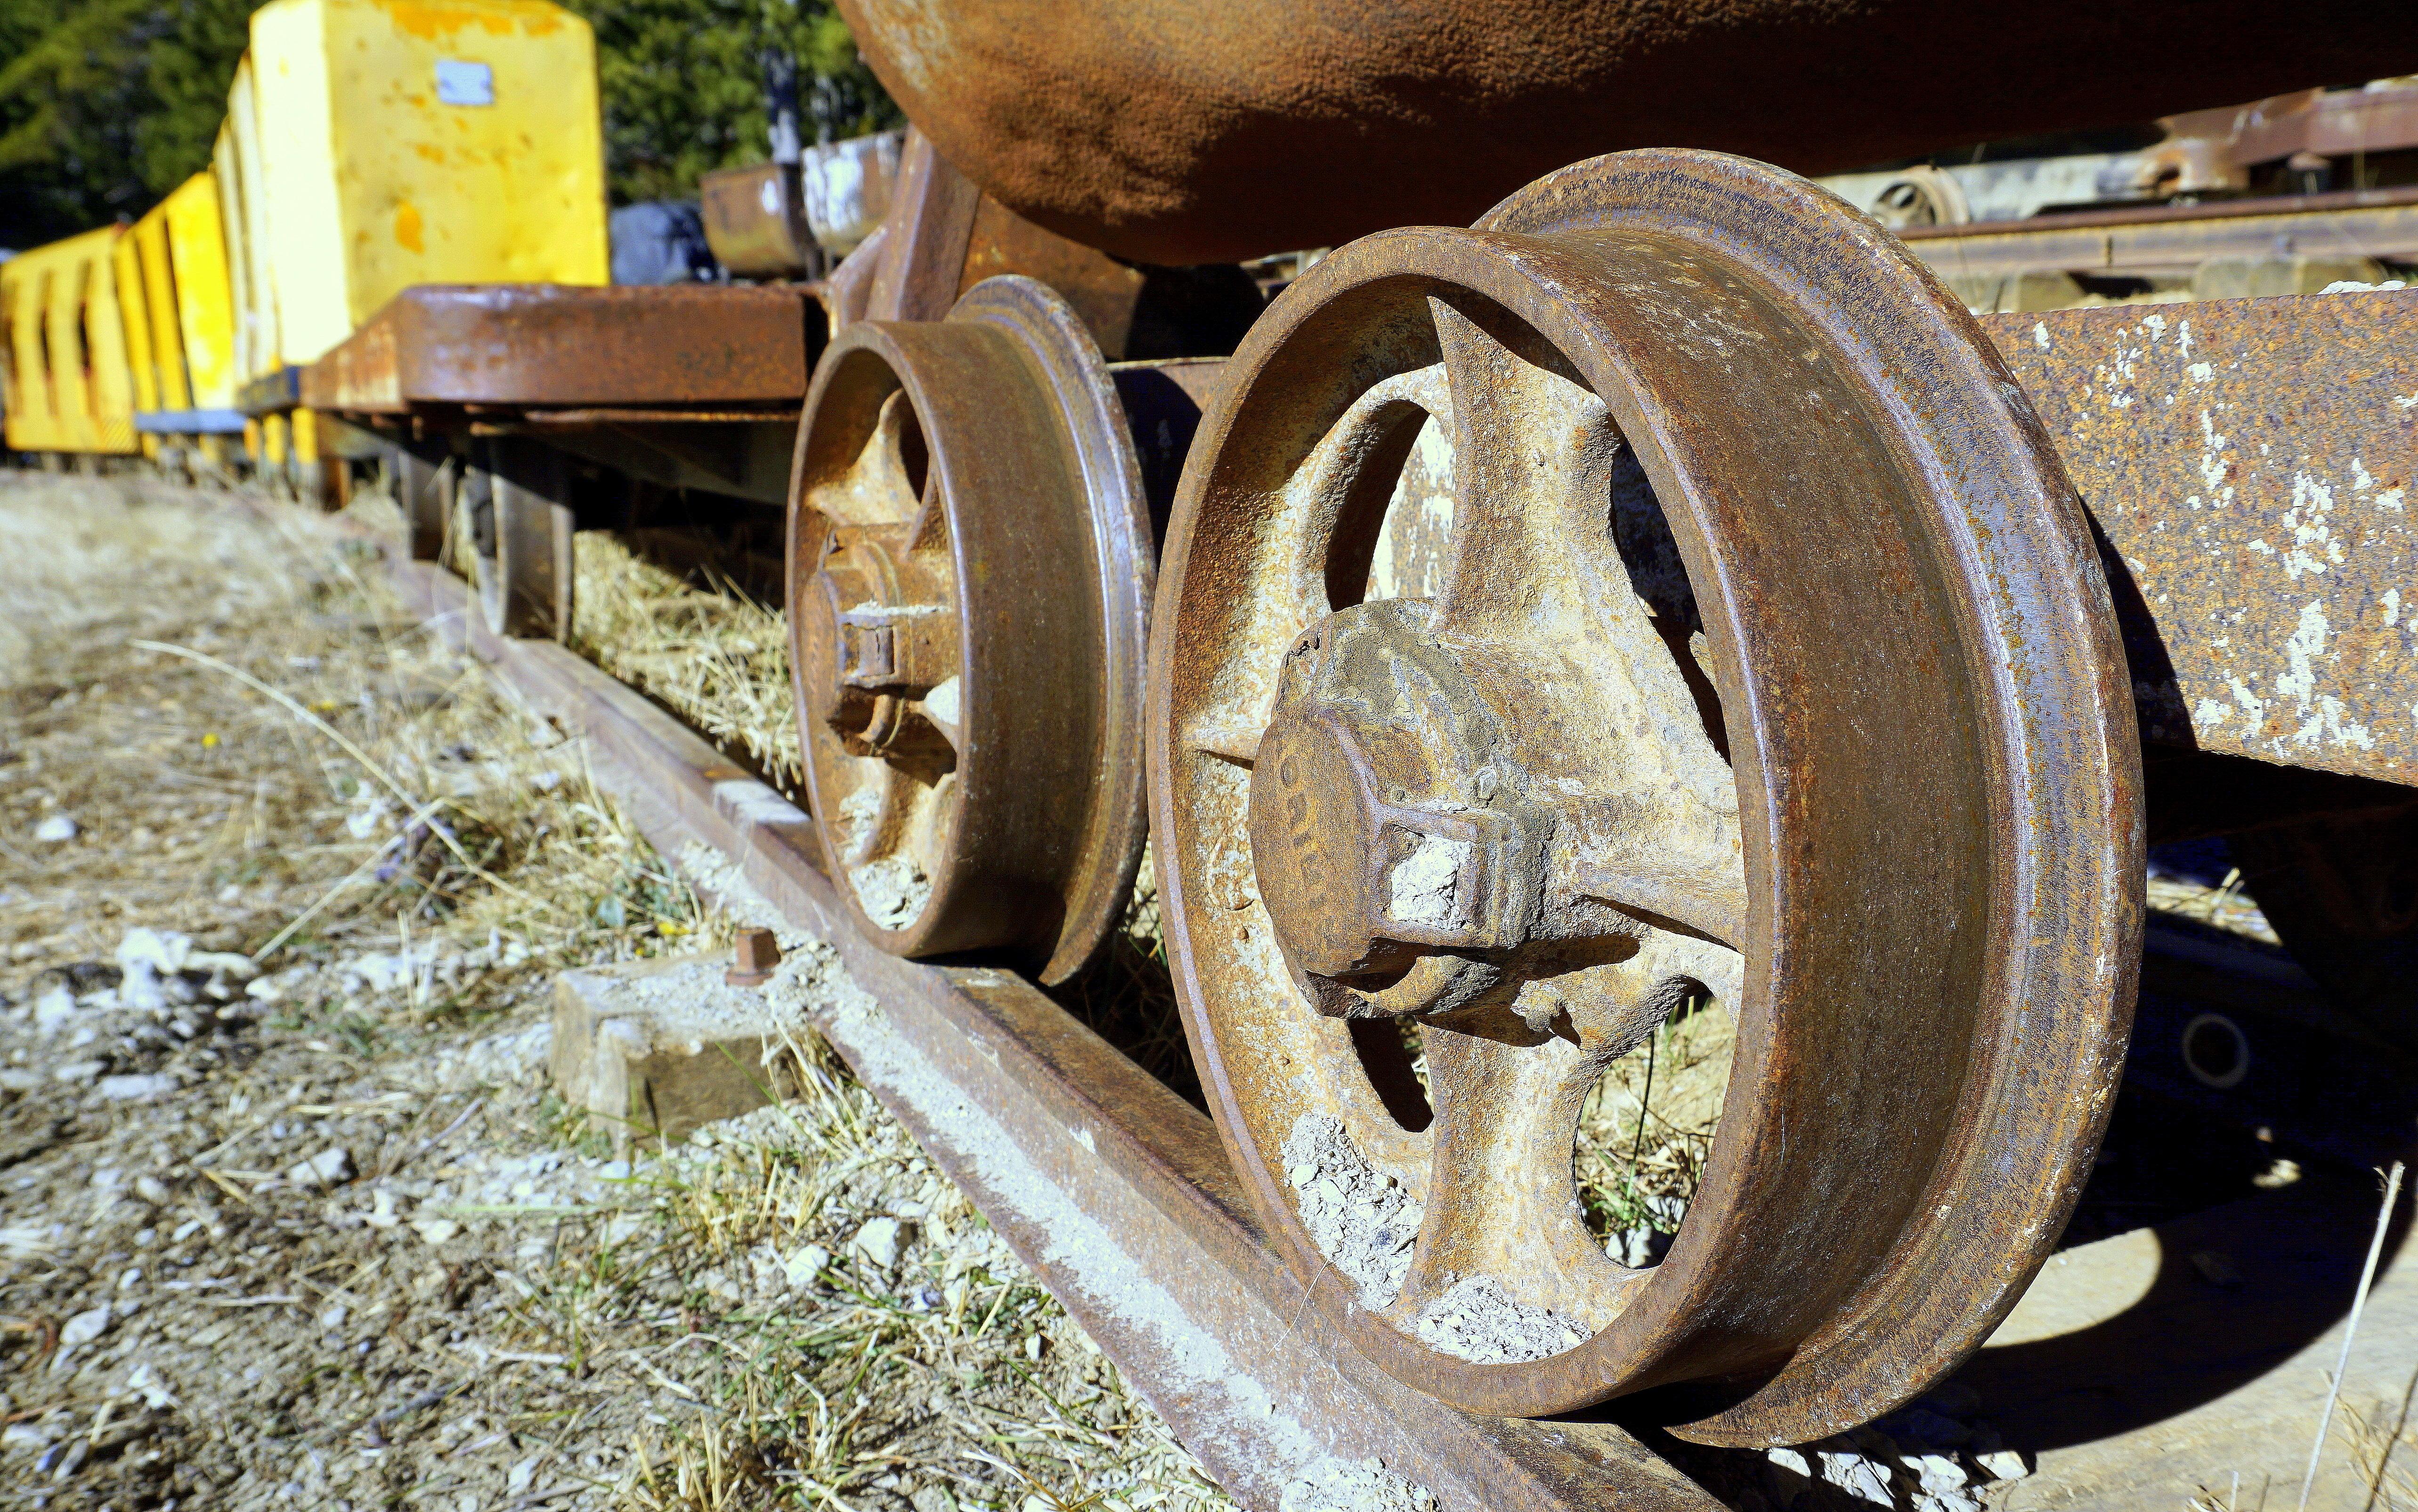 Station Op Wielen Houten.Gratis Afbeeldingen Hout Spoor Spoorweg Wiel Wagon Oud Trein